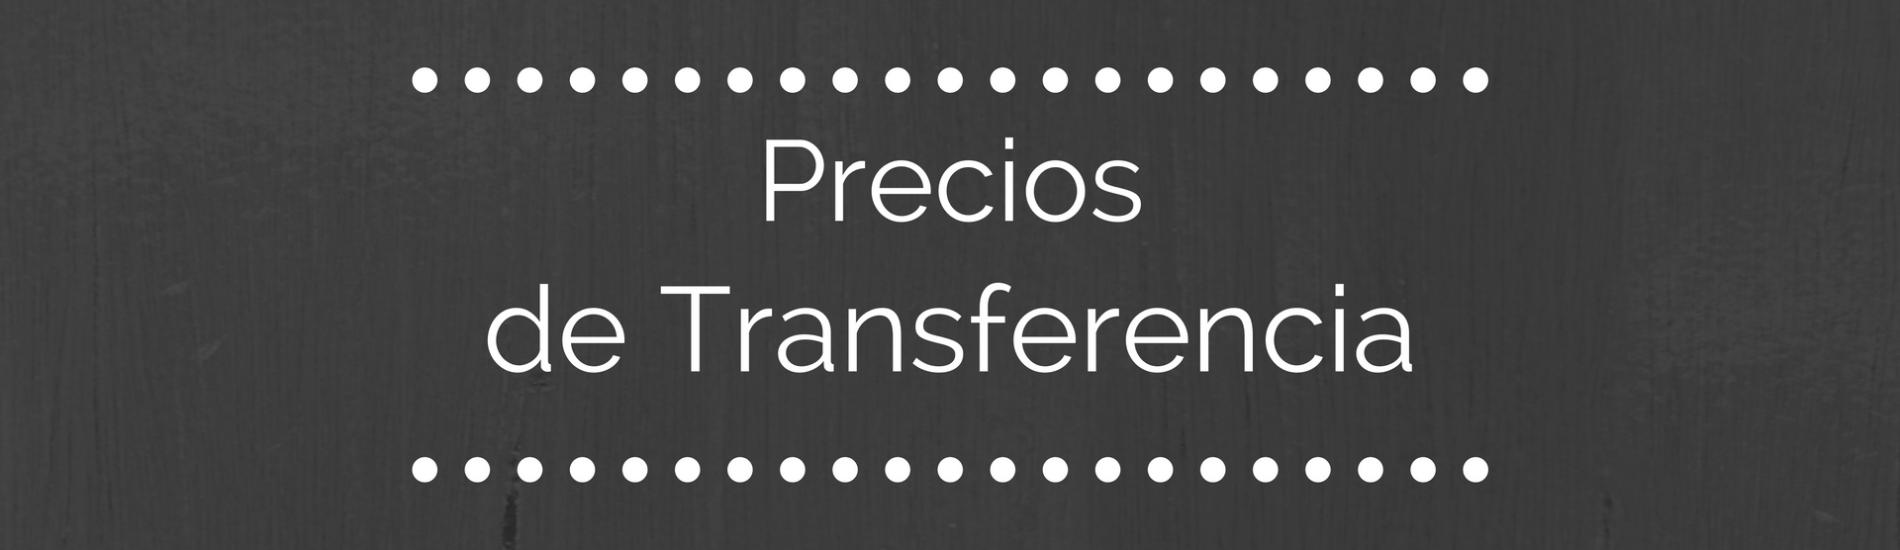 Taller: Precios de Transferencia